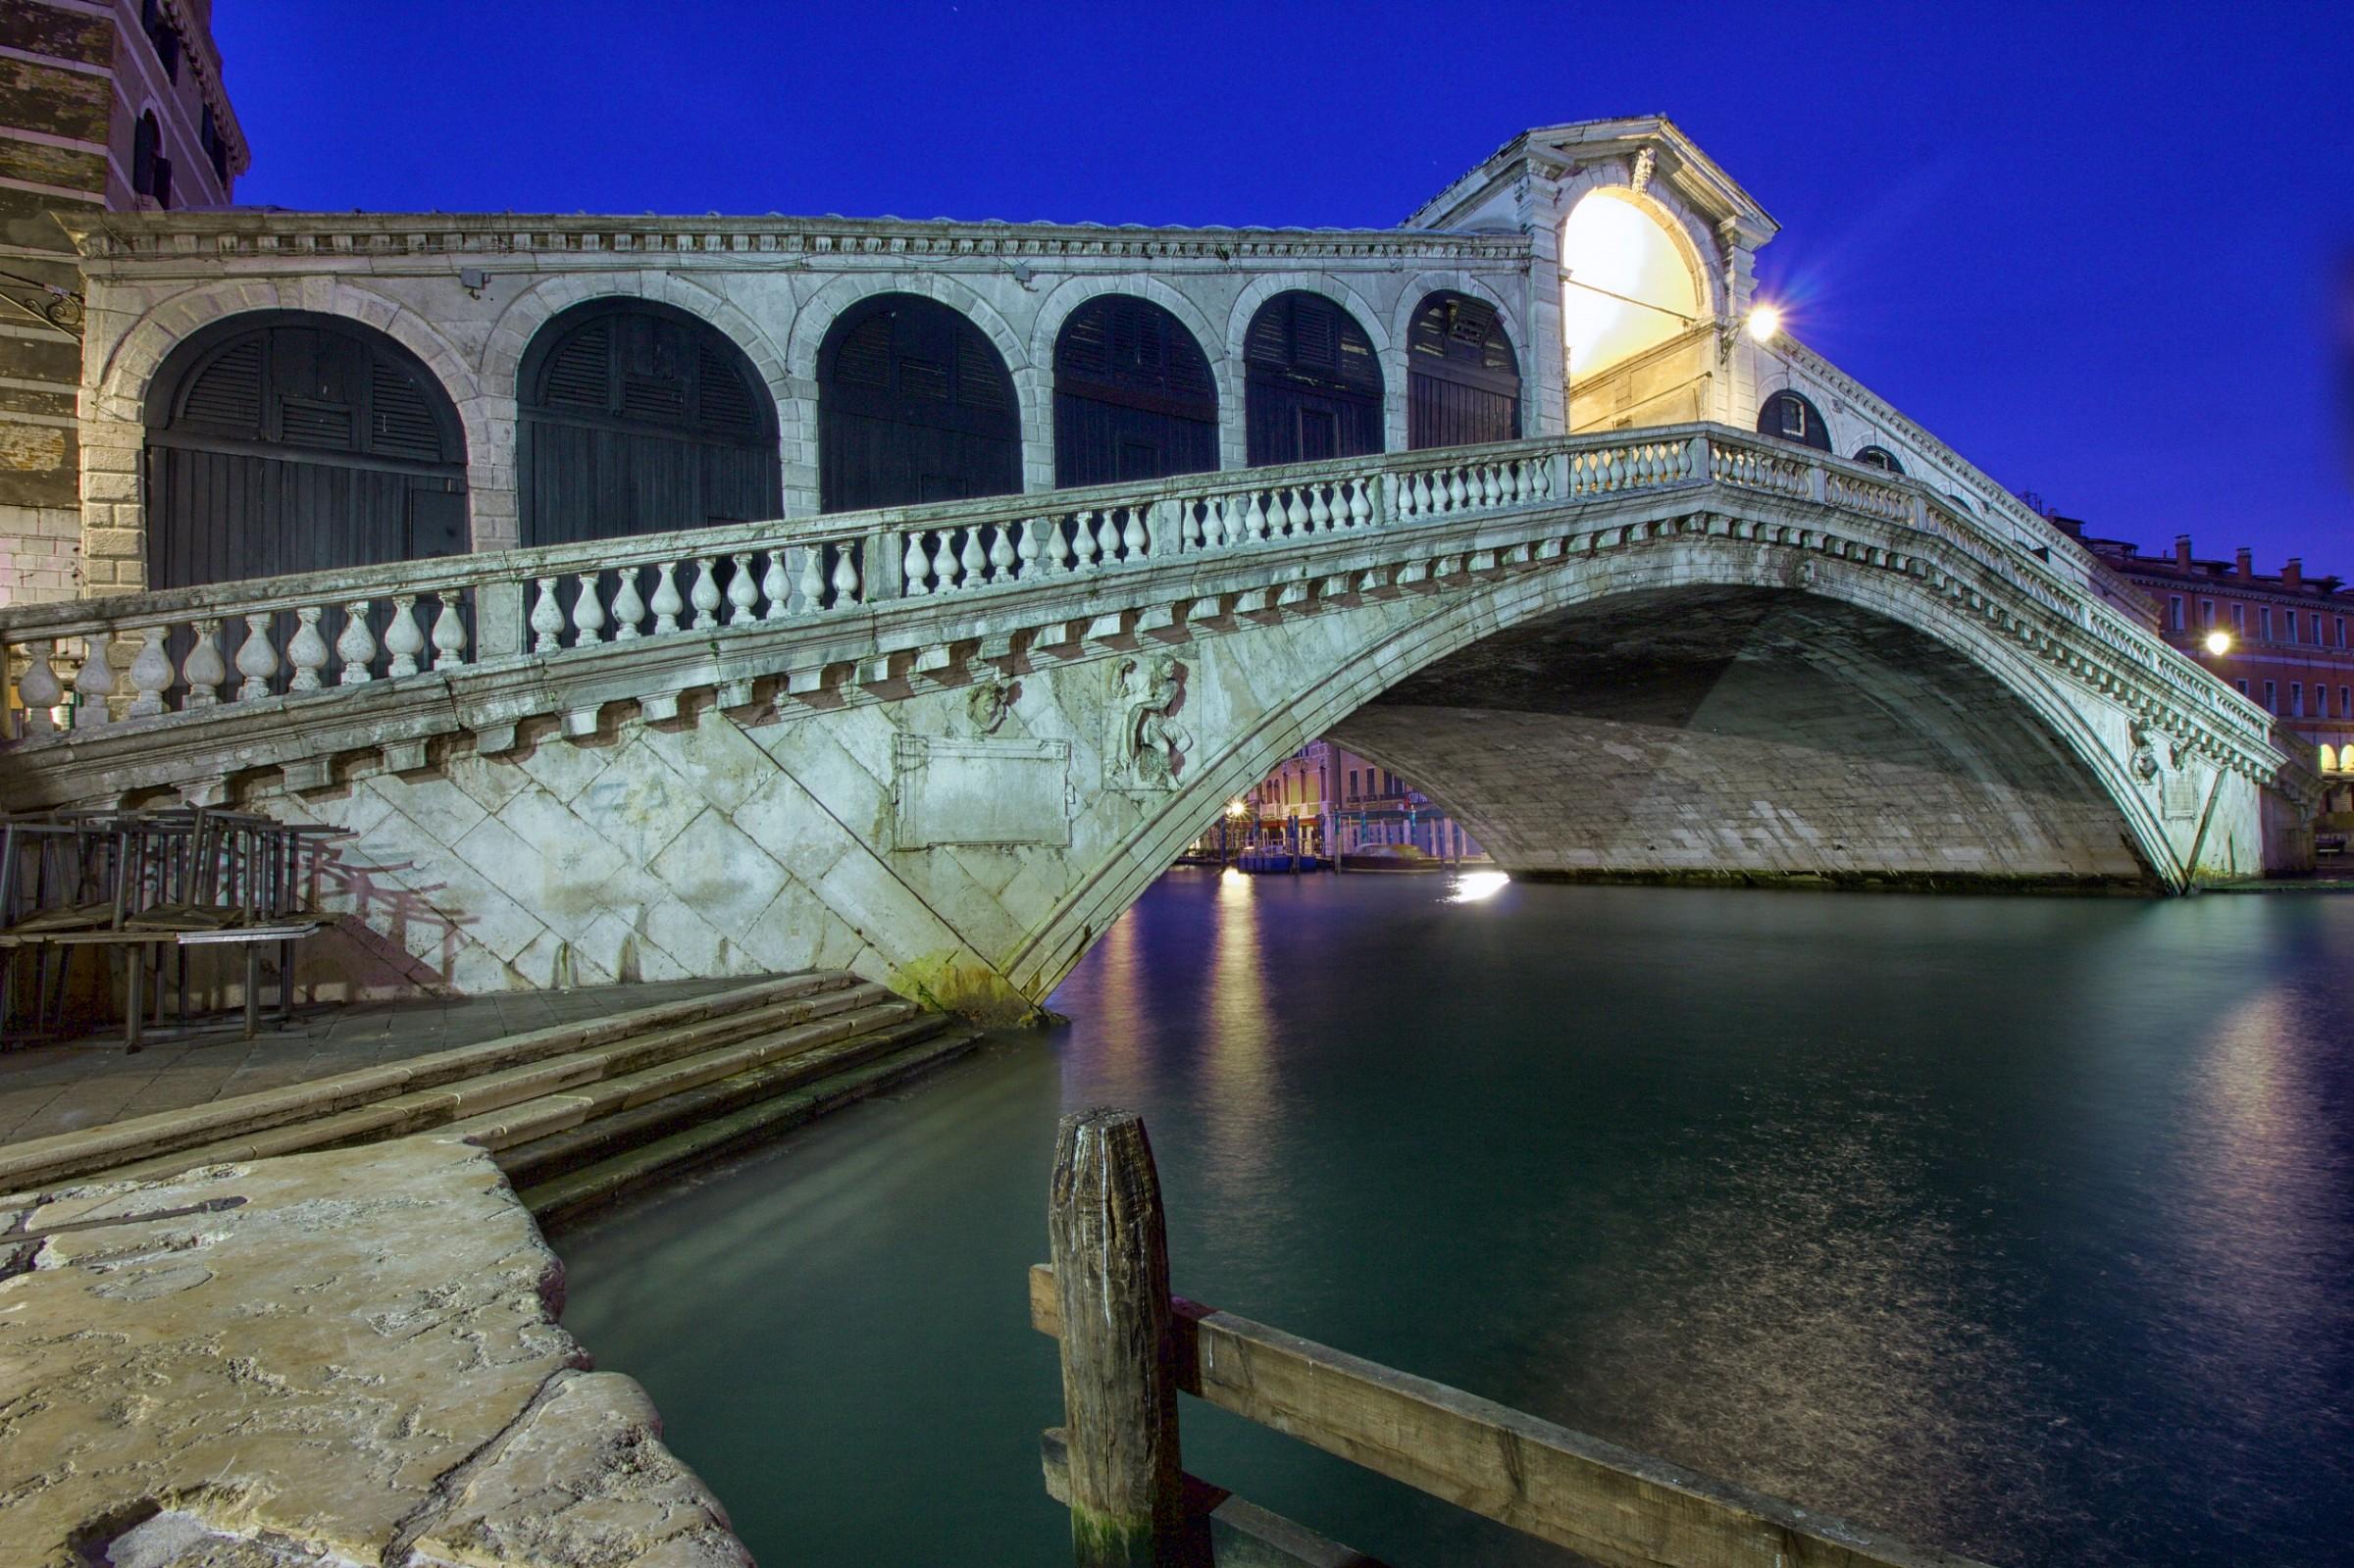 Now Blue Rialto Bridge...